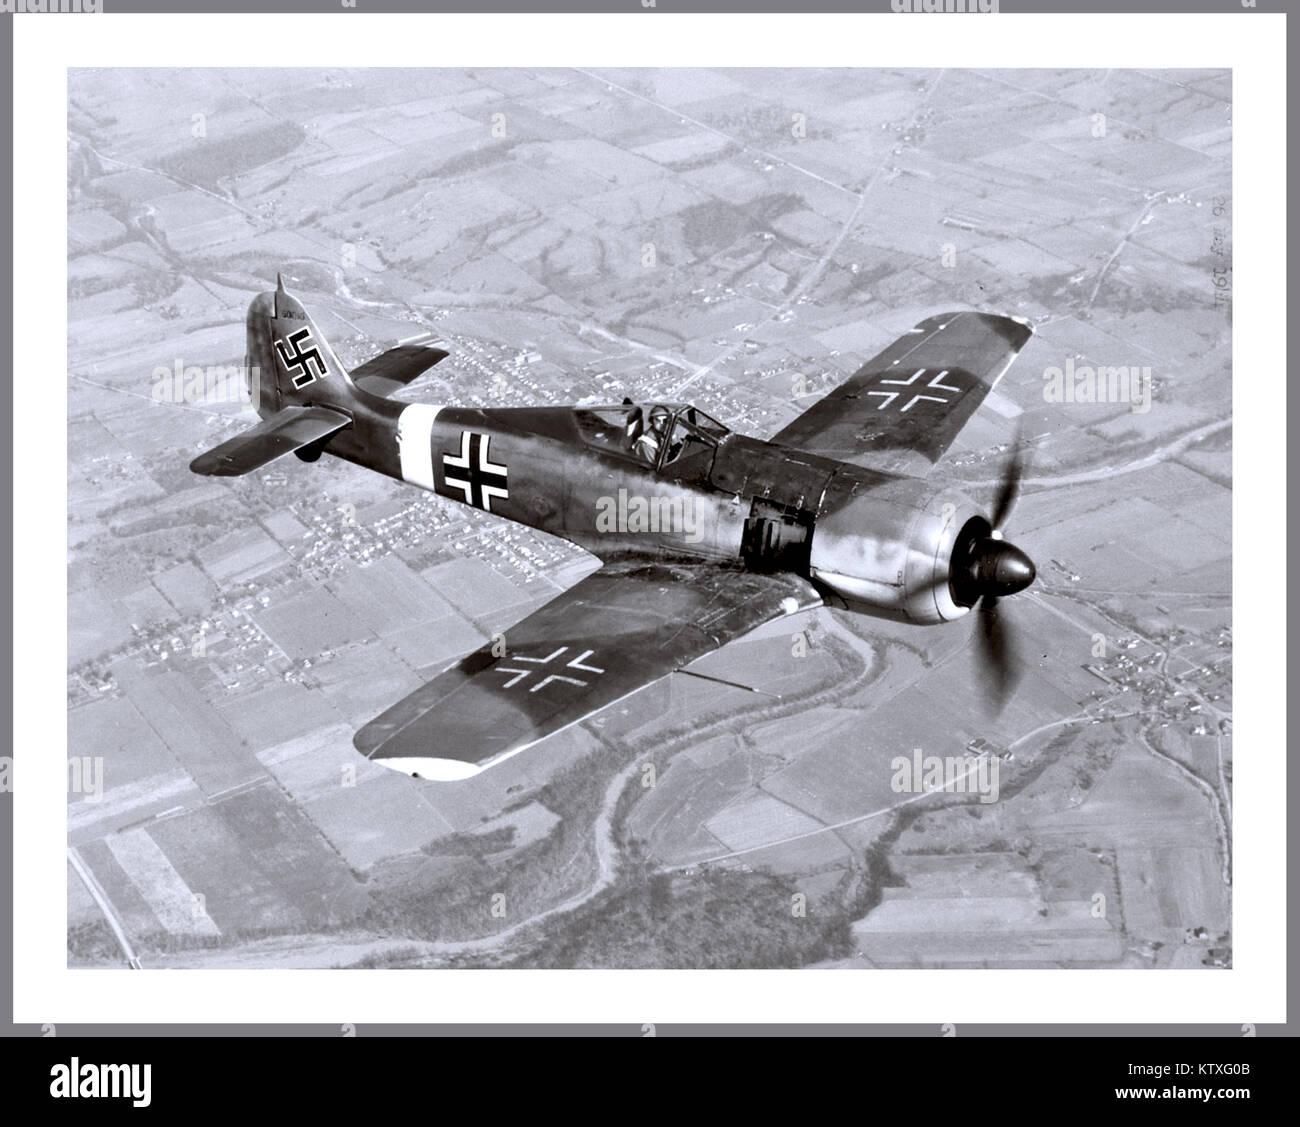 FOCKE-WULF 190 1940's WORLD WAR 2 The German Nazi Luftwaffe on patrol to engage U.S. American Airforce bombers with - Stock Image